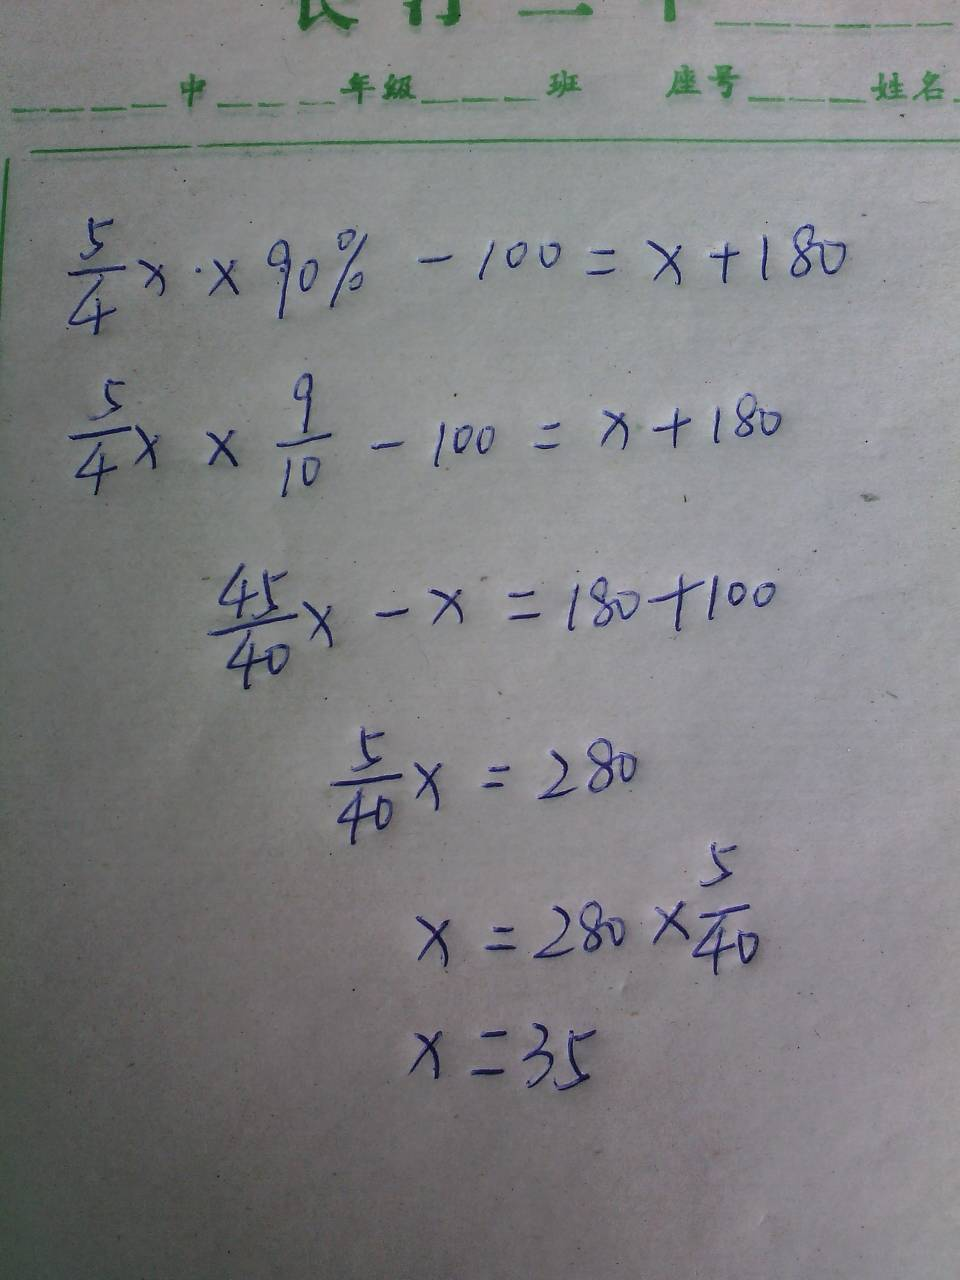 四分之5x×百分之90100=x+180